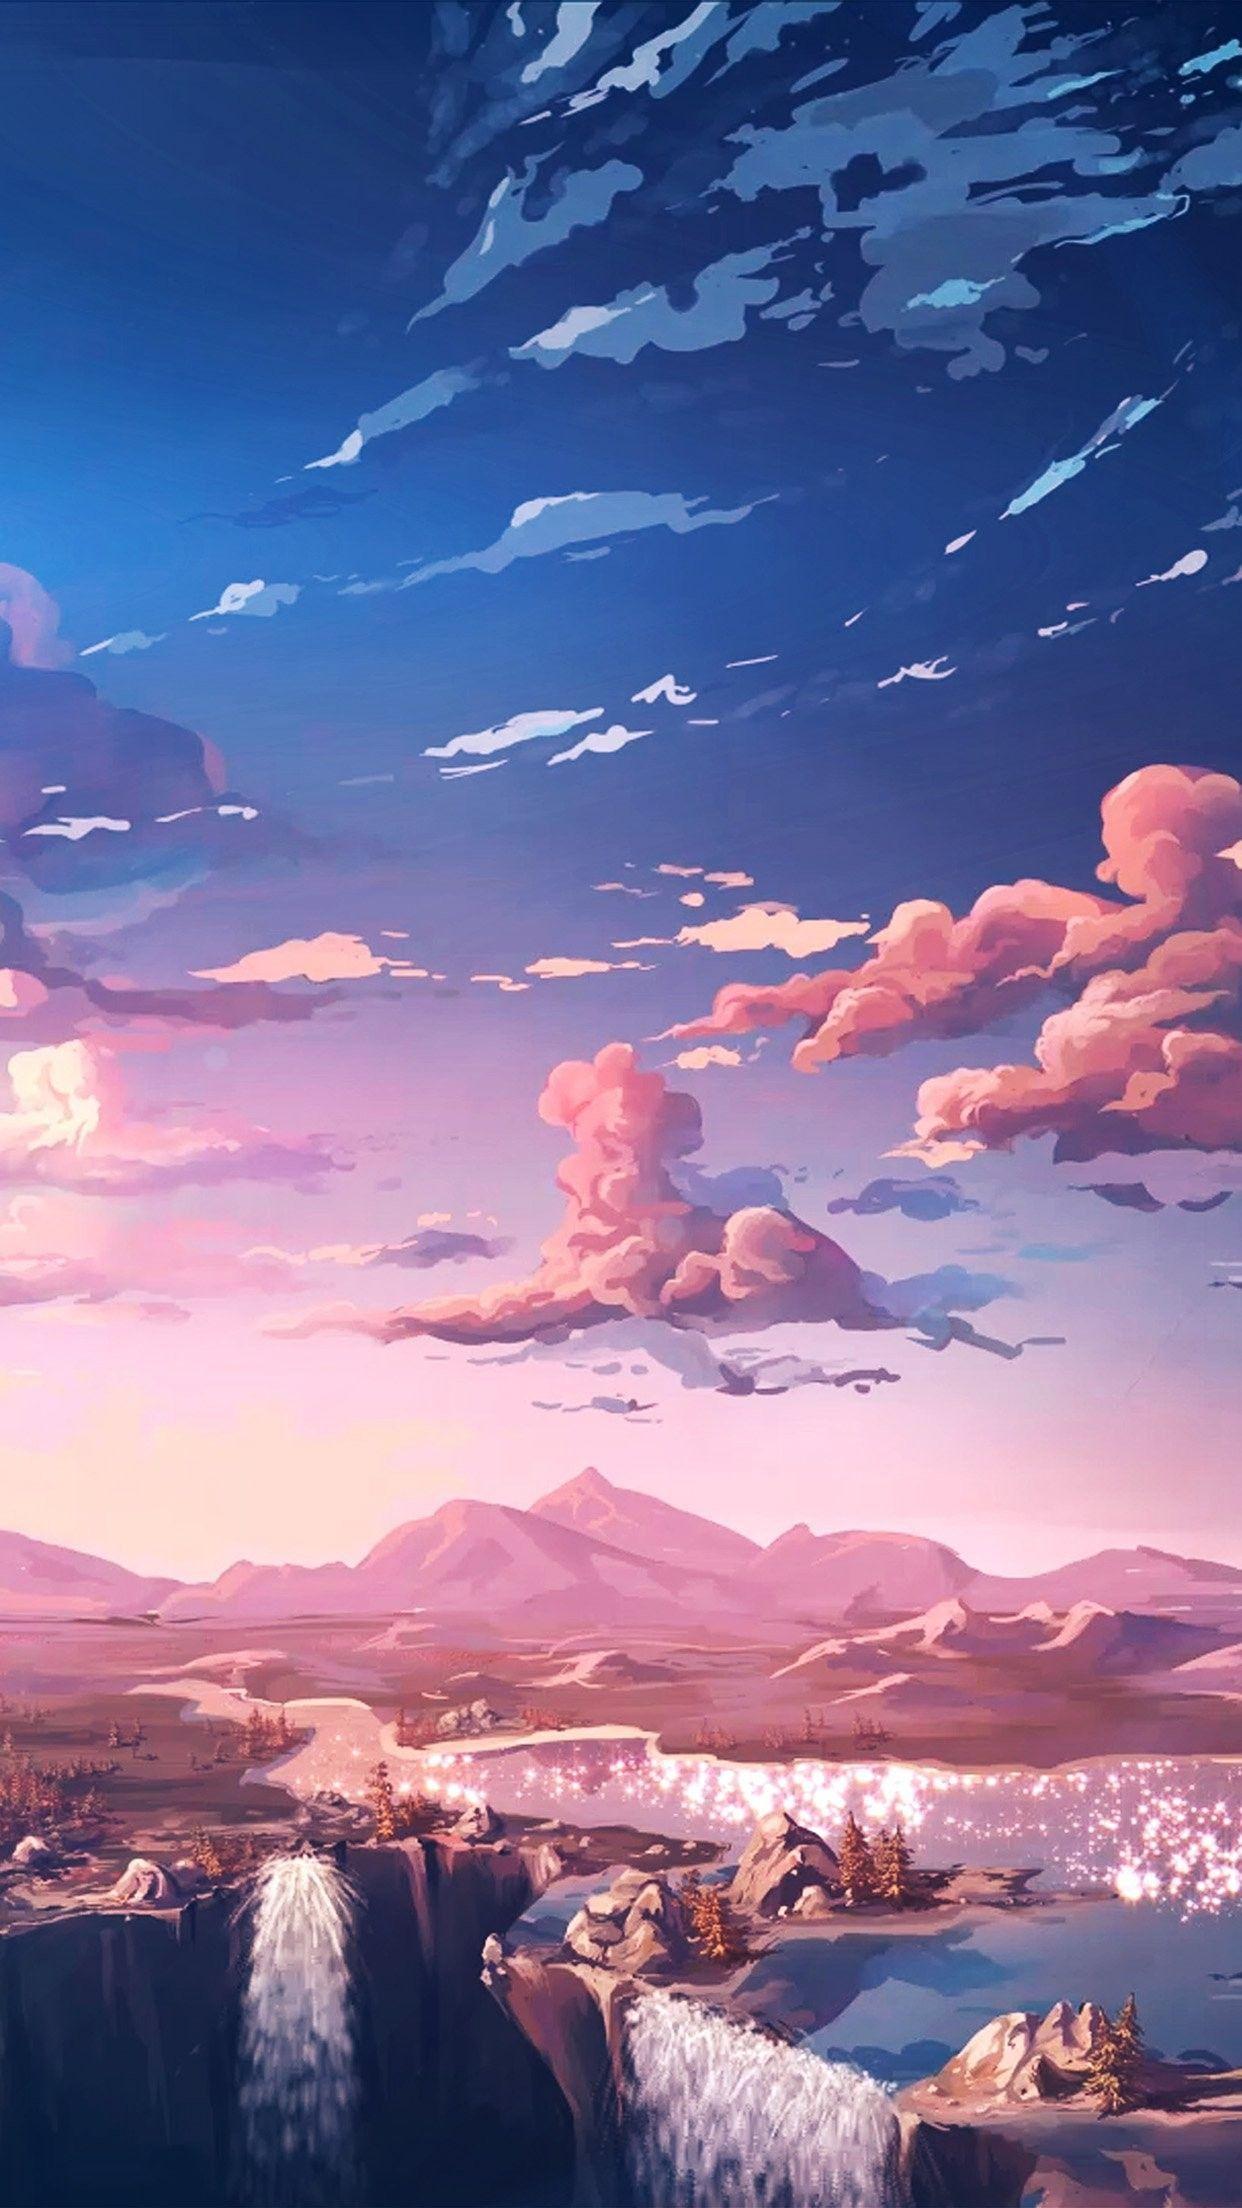 Peaceful Anime Background : peaceful, anime, background, Peaceful, Anime, Wallpapers, Backgrounds, WallpaperAccess